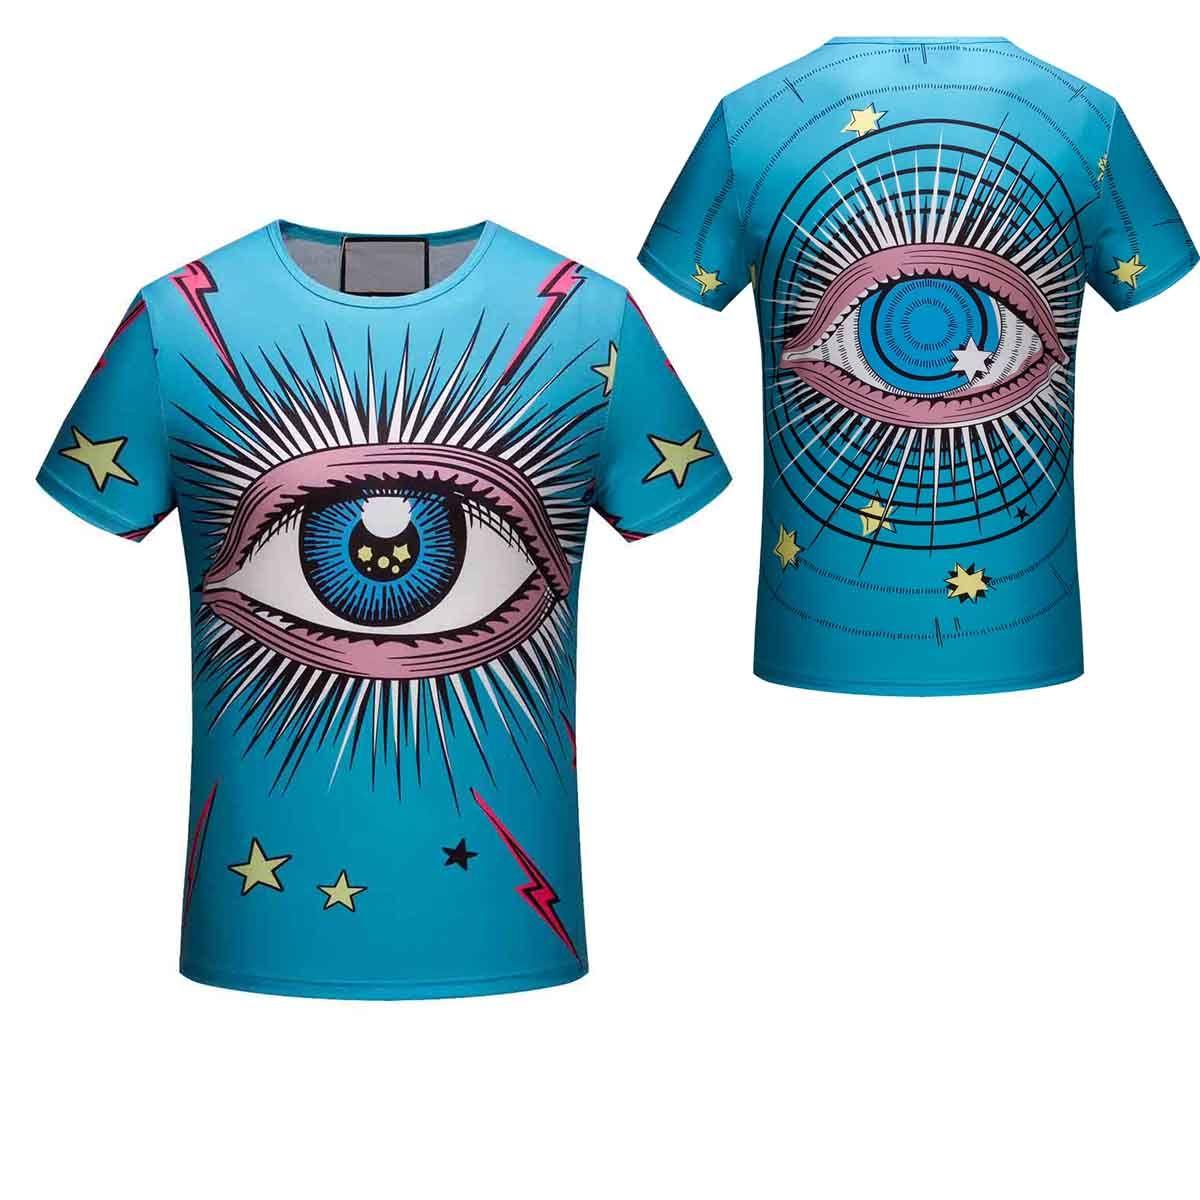 ab9fe41b32bf Fashion Brand Men Short Sleeve T Shirt Little Funny Eyes Print High ...